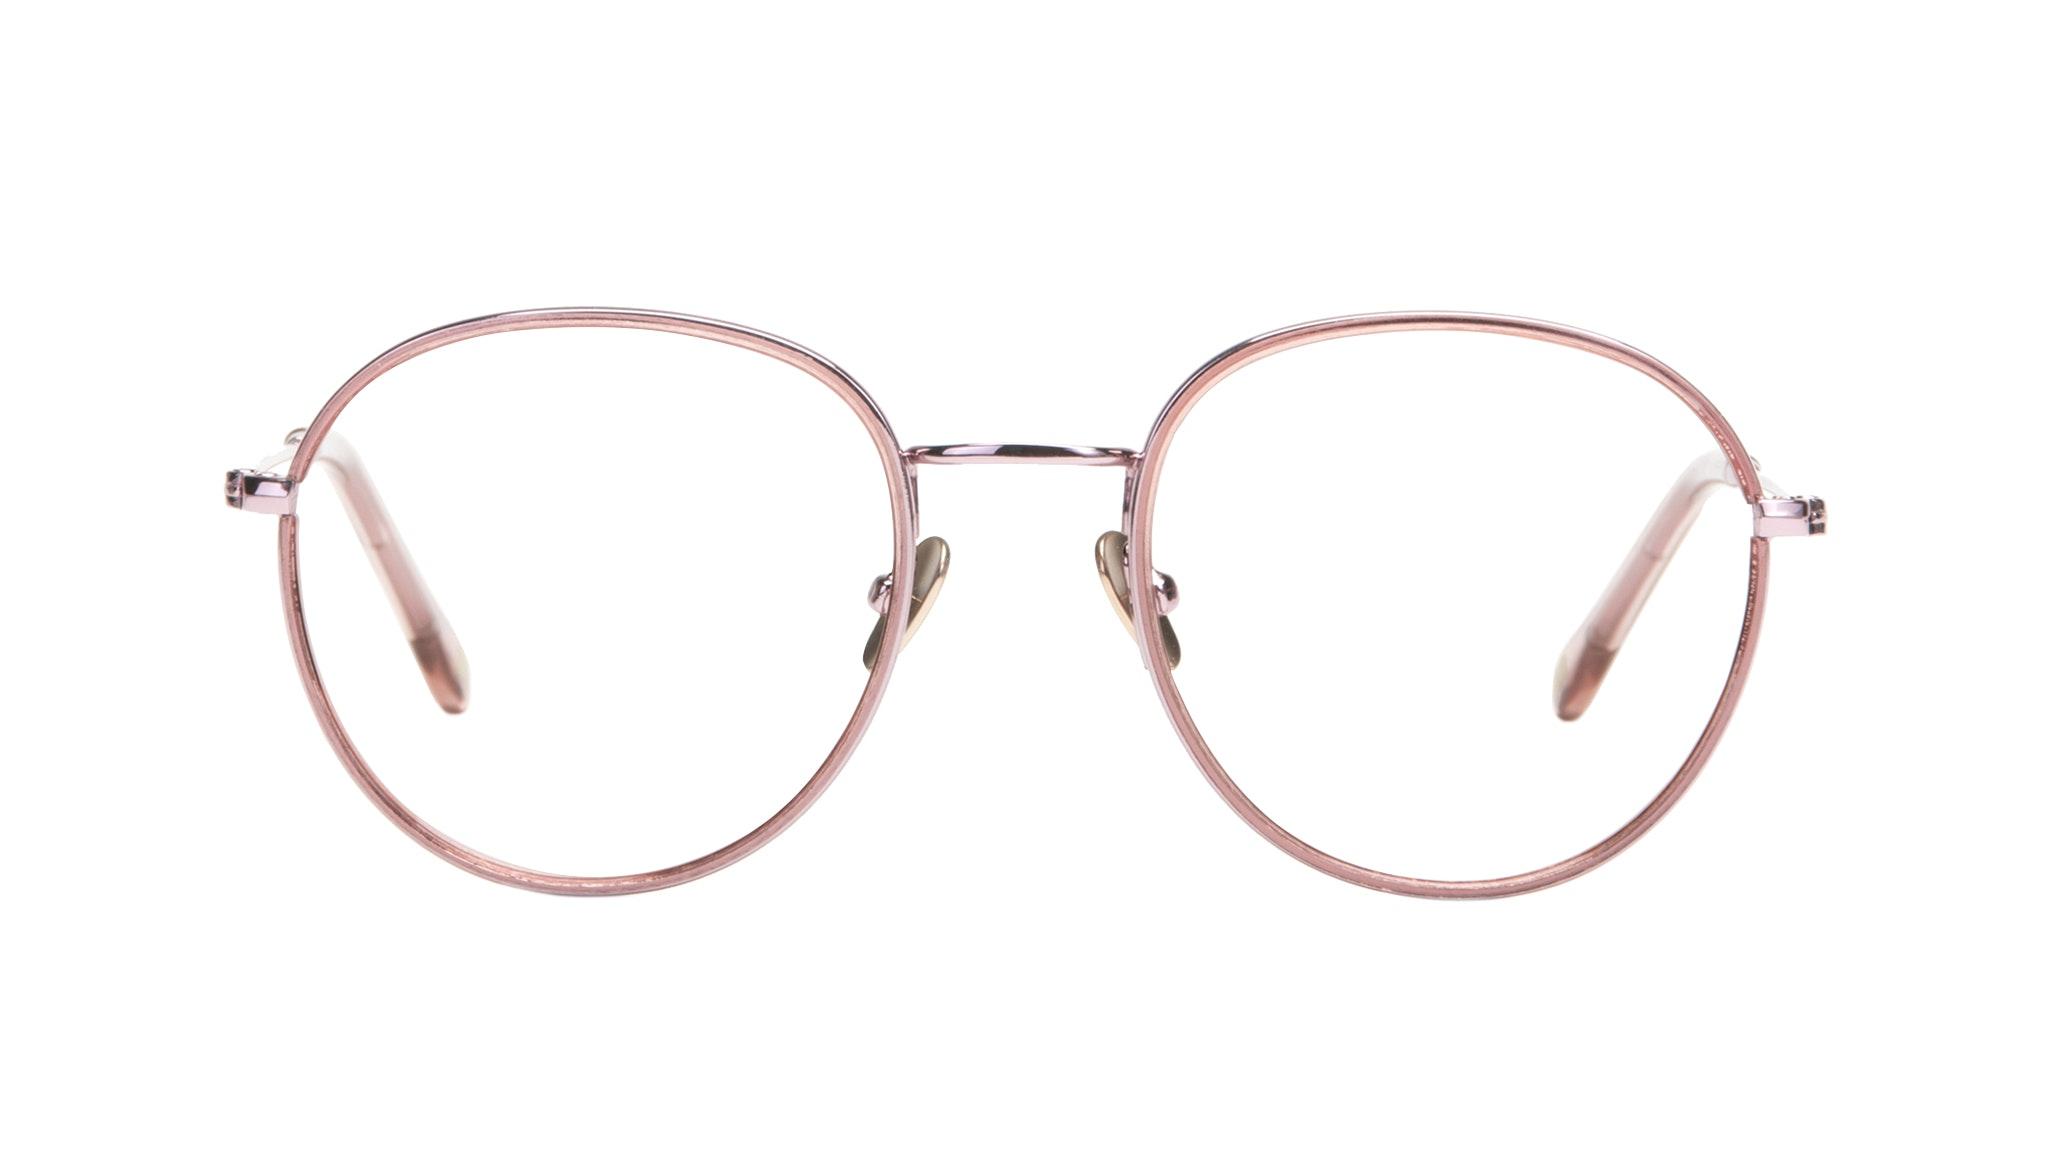 Affordable Fashion Glasses Aviator Round Eyeglasses Women Subrosa Romance Front